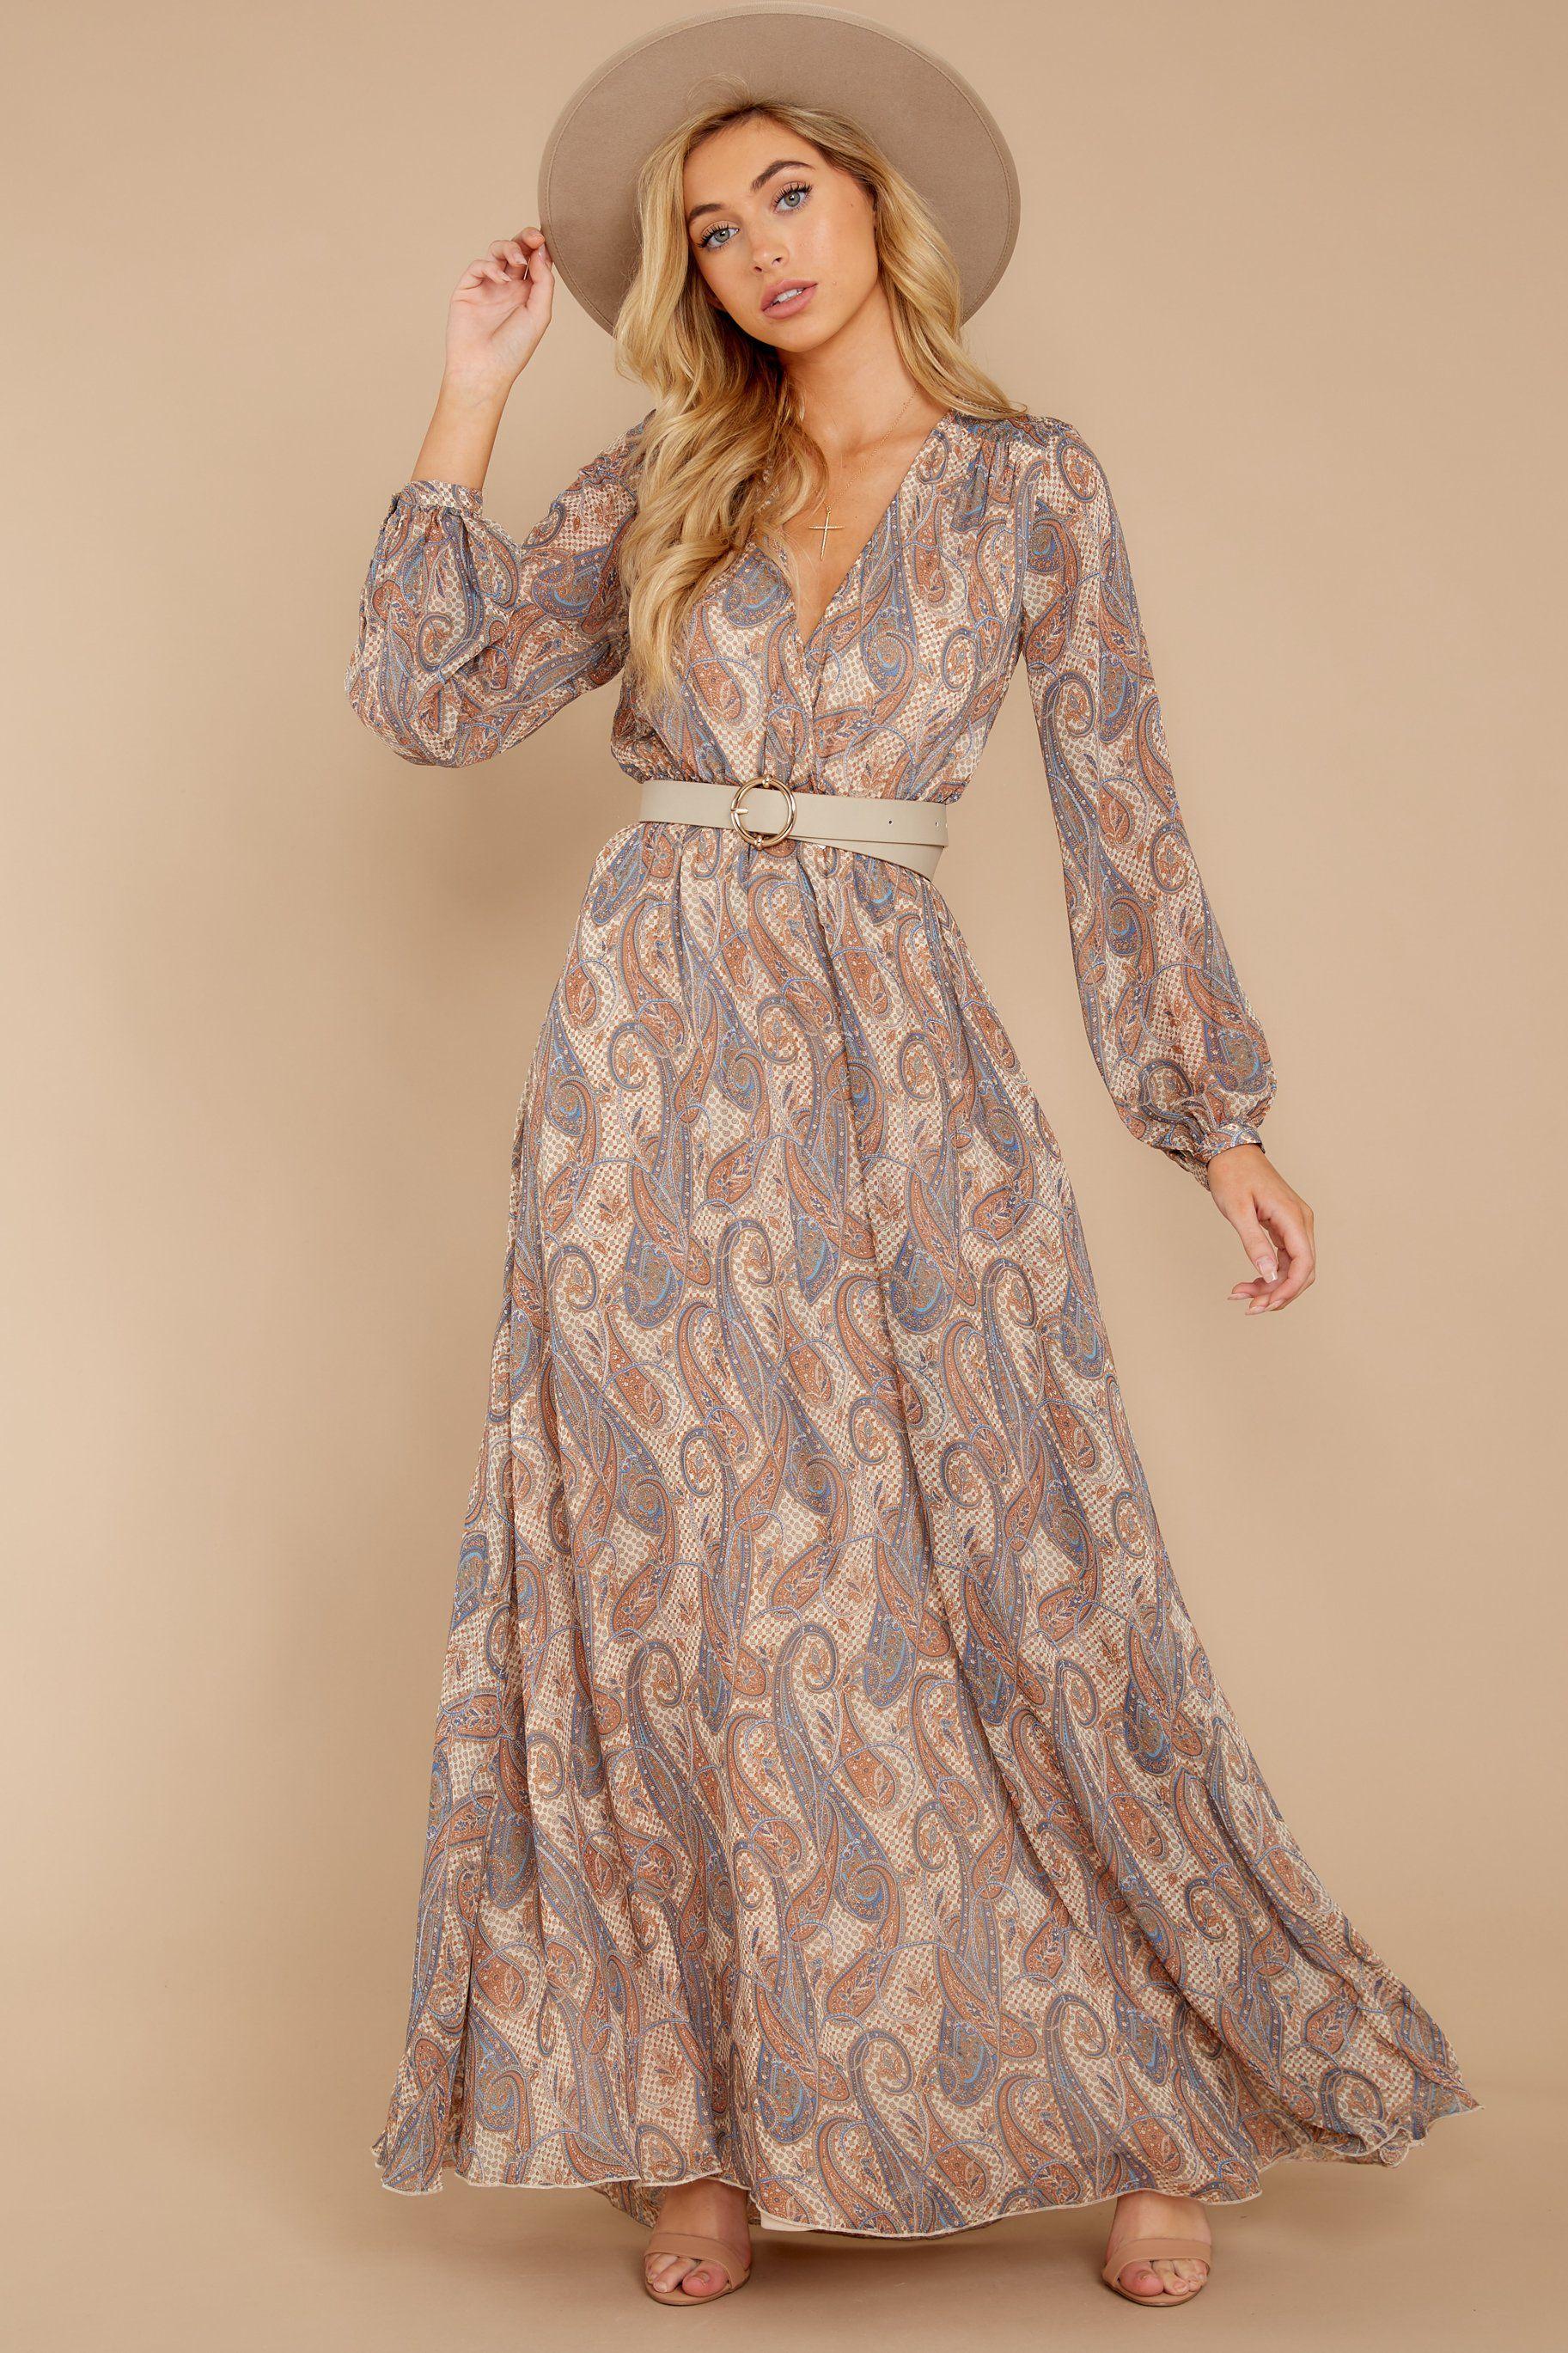 70s Dresses Disco Dress Hippie Dress Wrap Dress Paisley Print Maxi Dress Printed Maxi Dress Disco Dress [ 2738 x 1825 Pixel ]